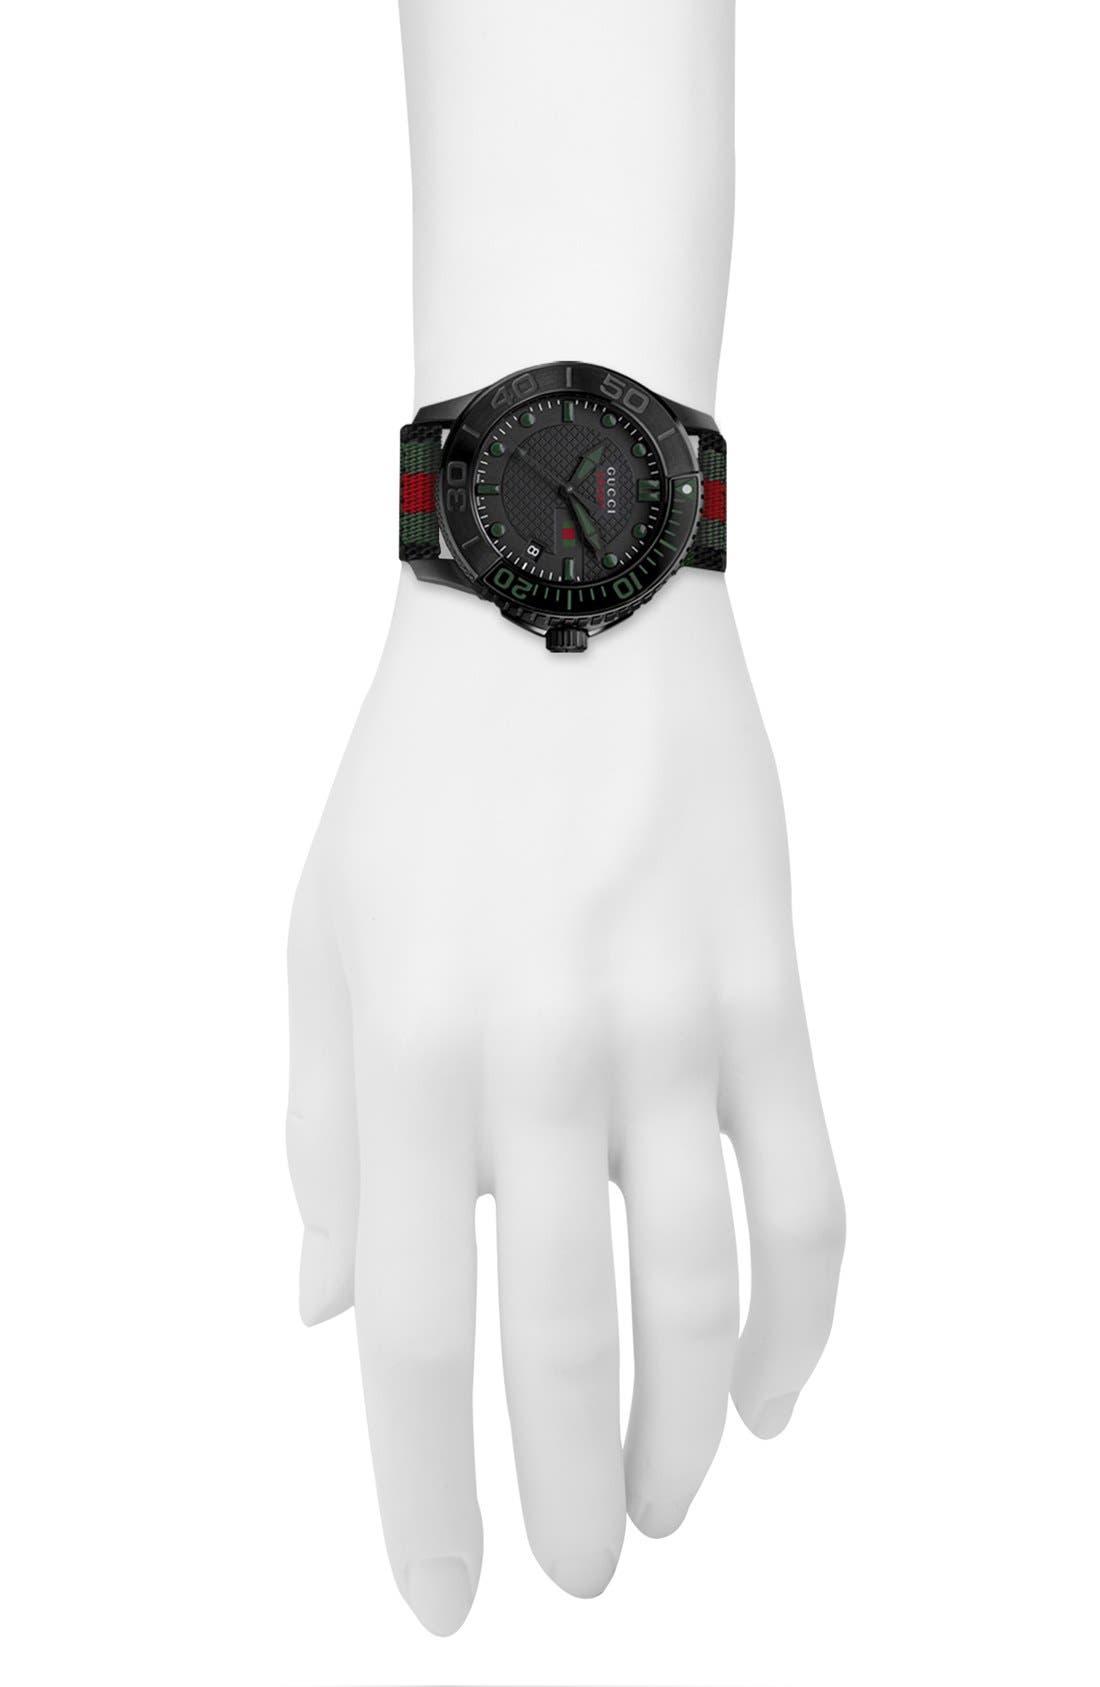 GUCCI, 'G Timeless' Nylon Strap Watch, 44mm, Alternate thumbnail 3, color, 001